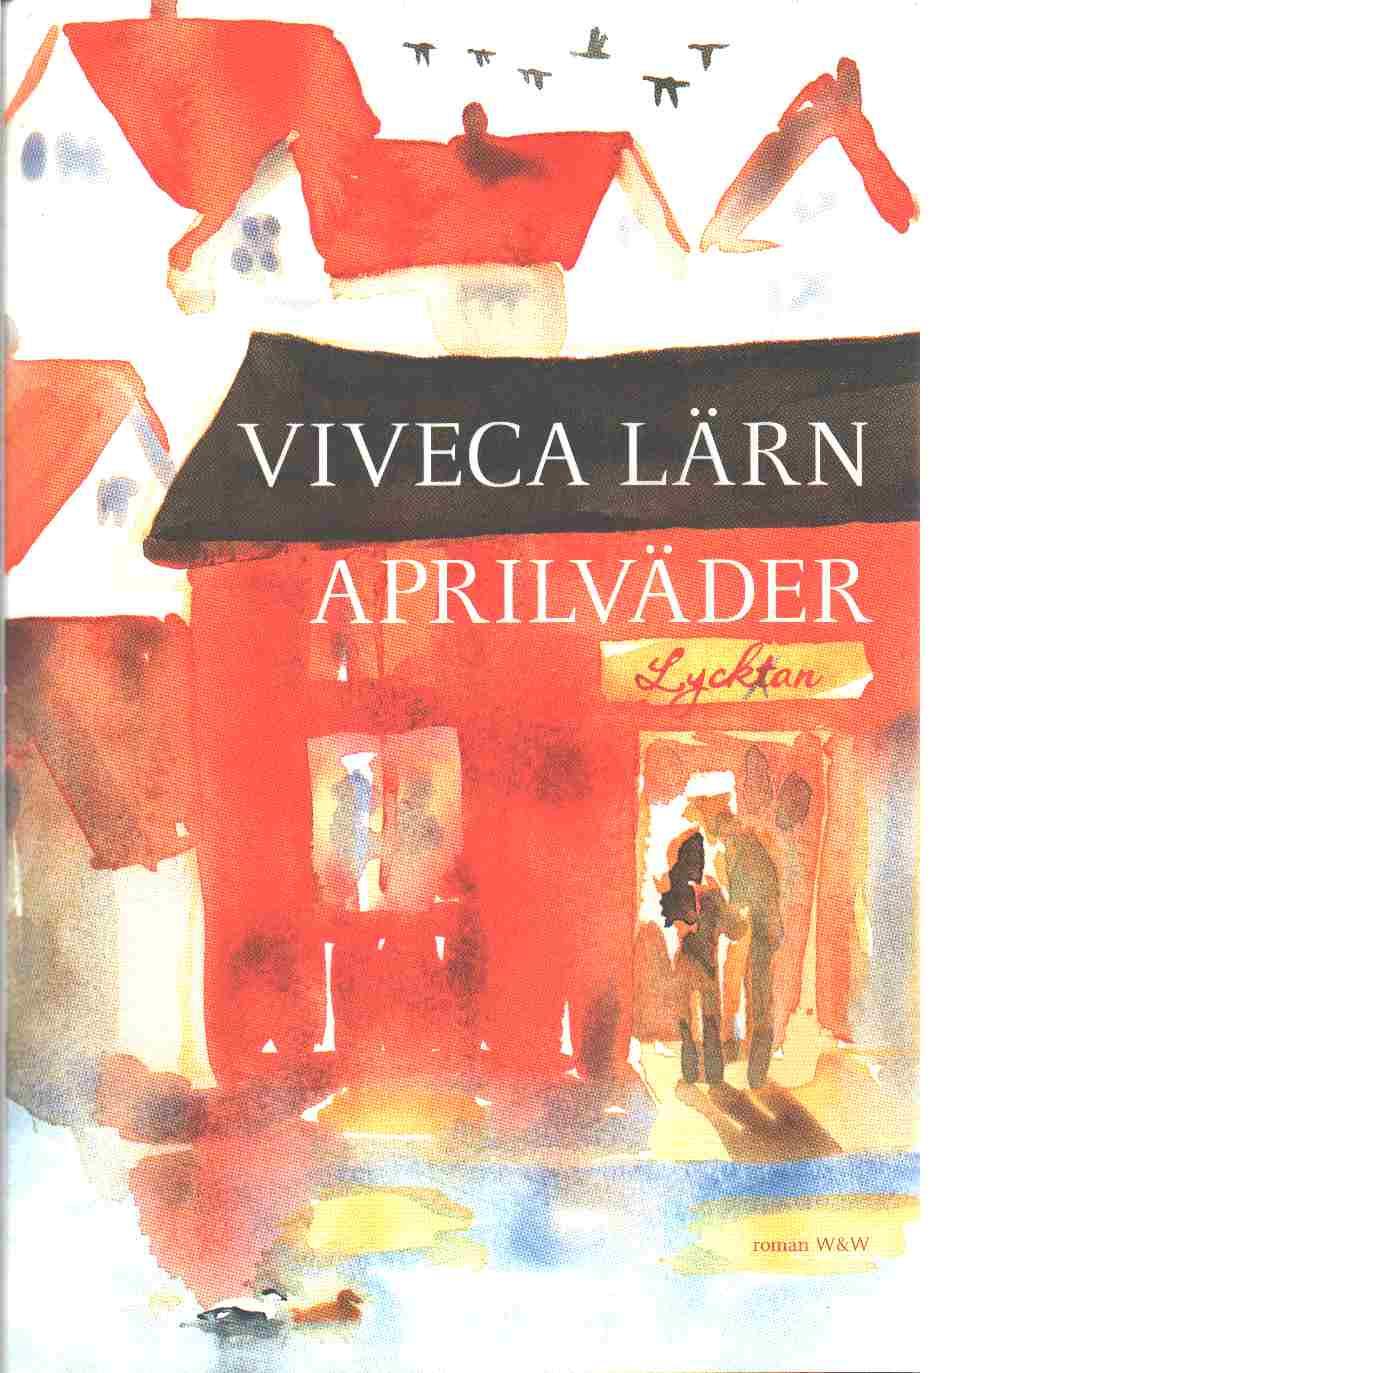 Aprilväder - Lärn, Viveca